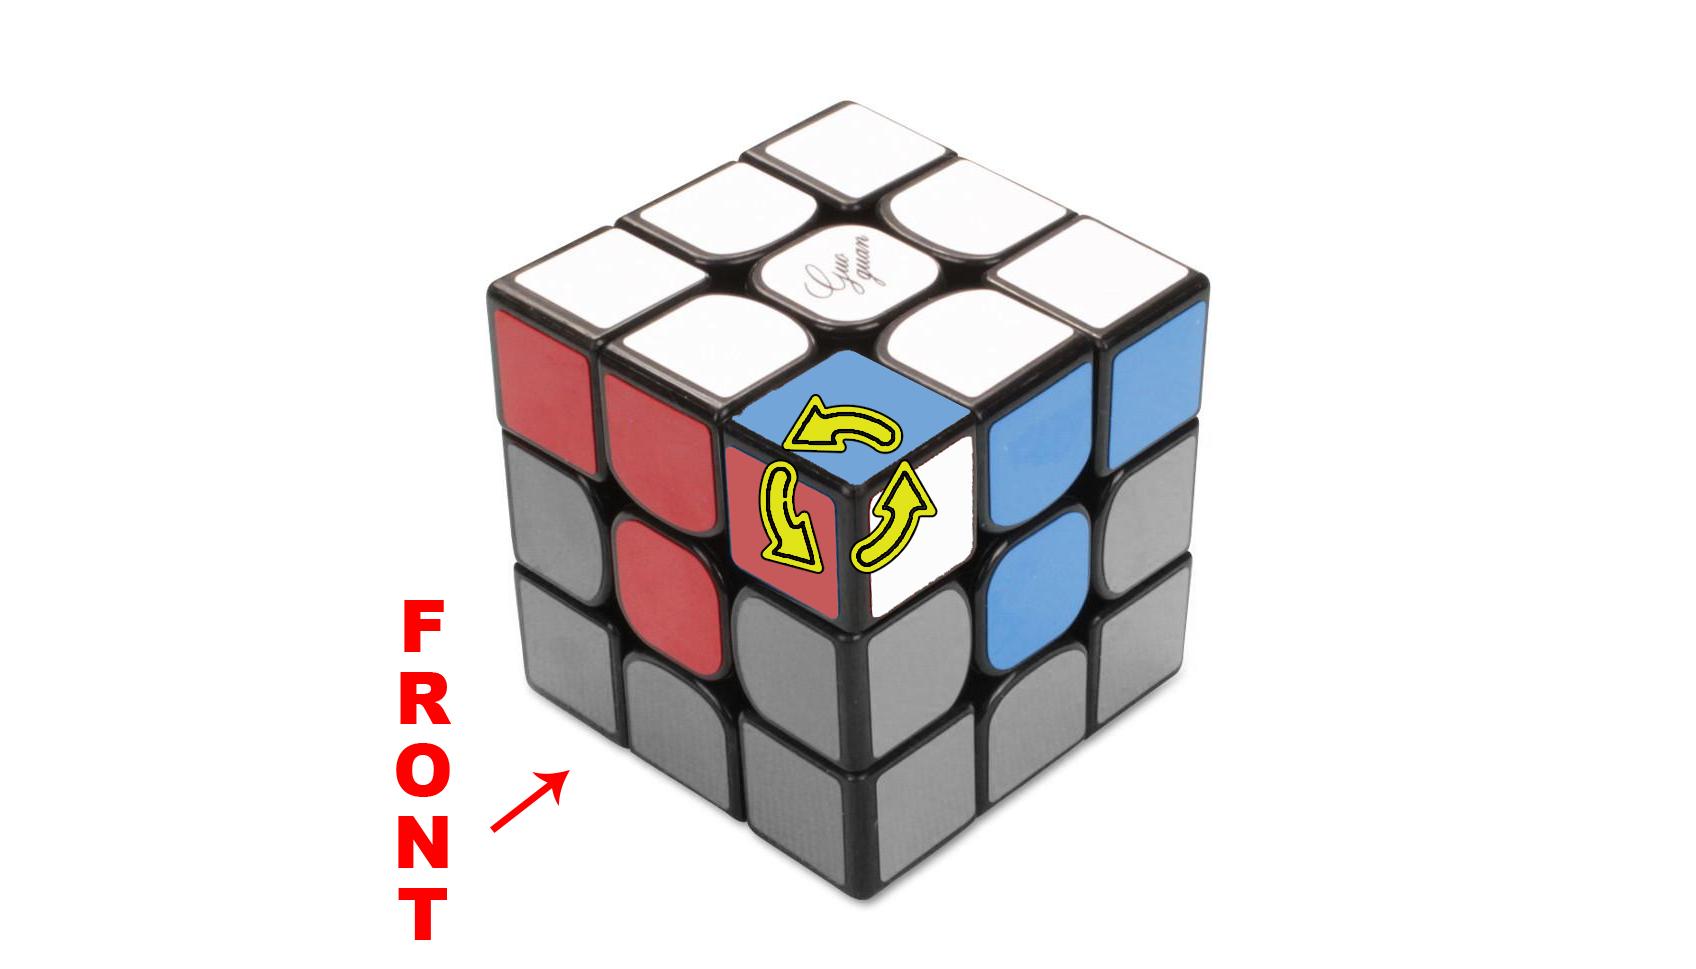 How to solve a Rubik's 3x3 - Step 2 - The Corners - Step 2e